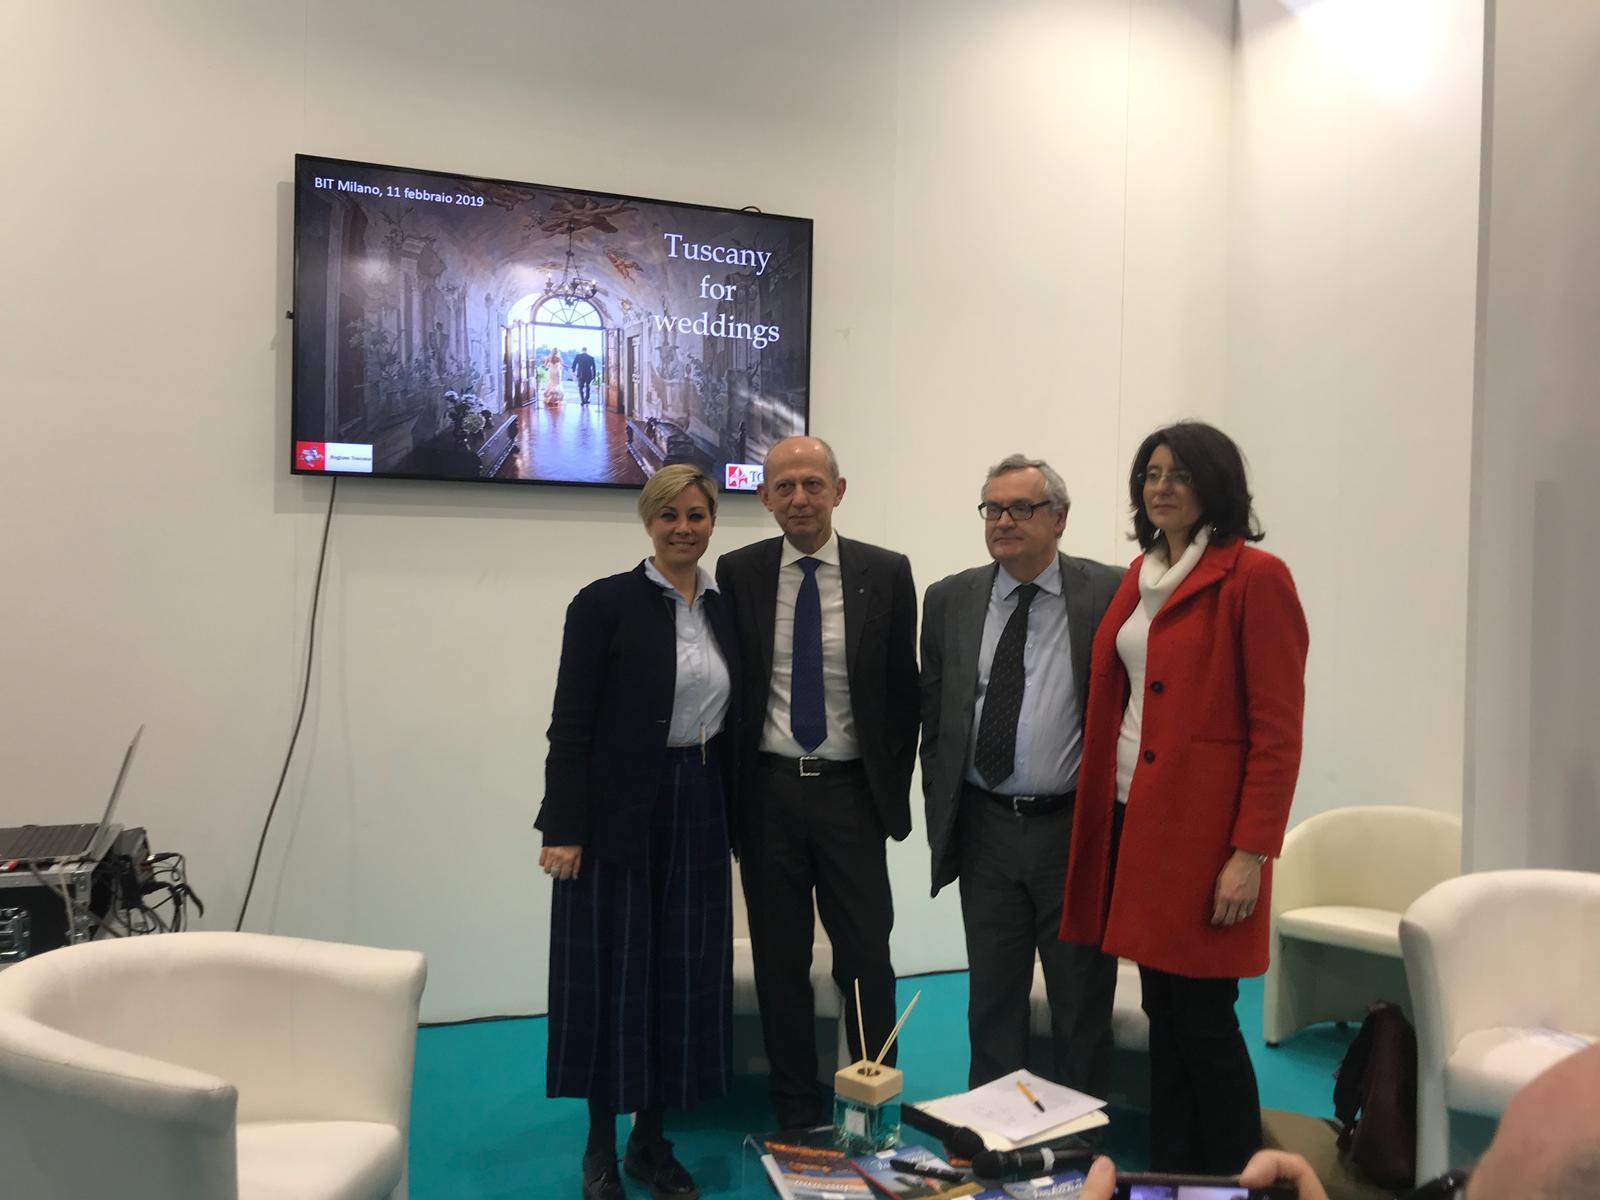 Matrimoni Vip Toscana : Turismo wedding la toscana presenta i risultati alla bit